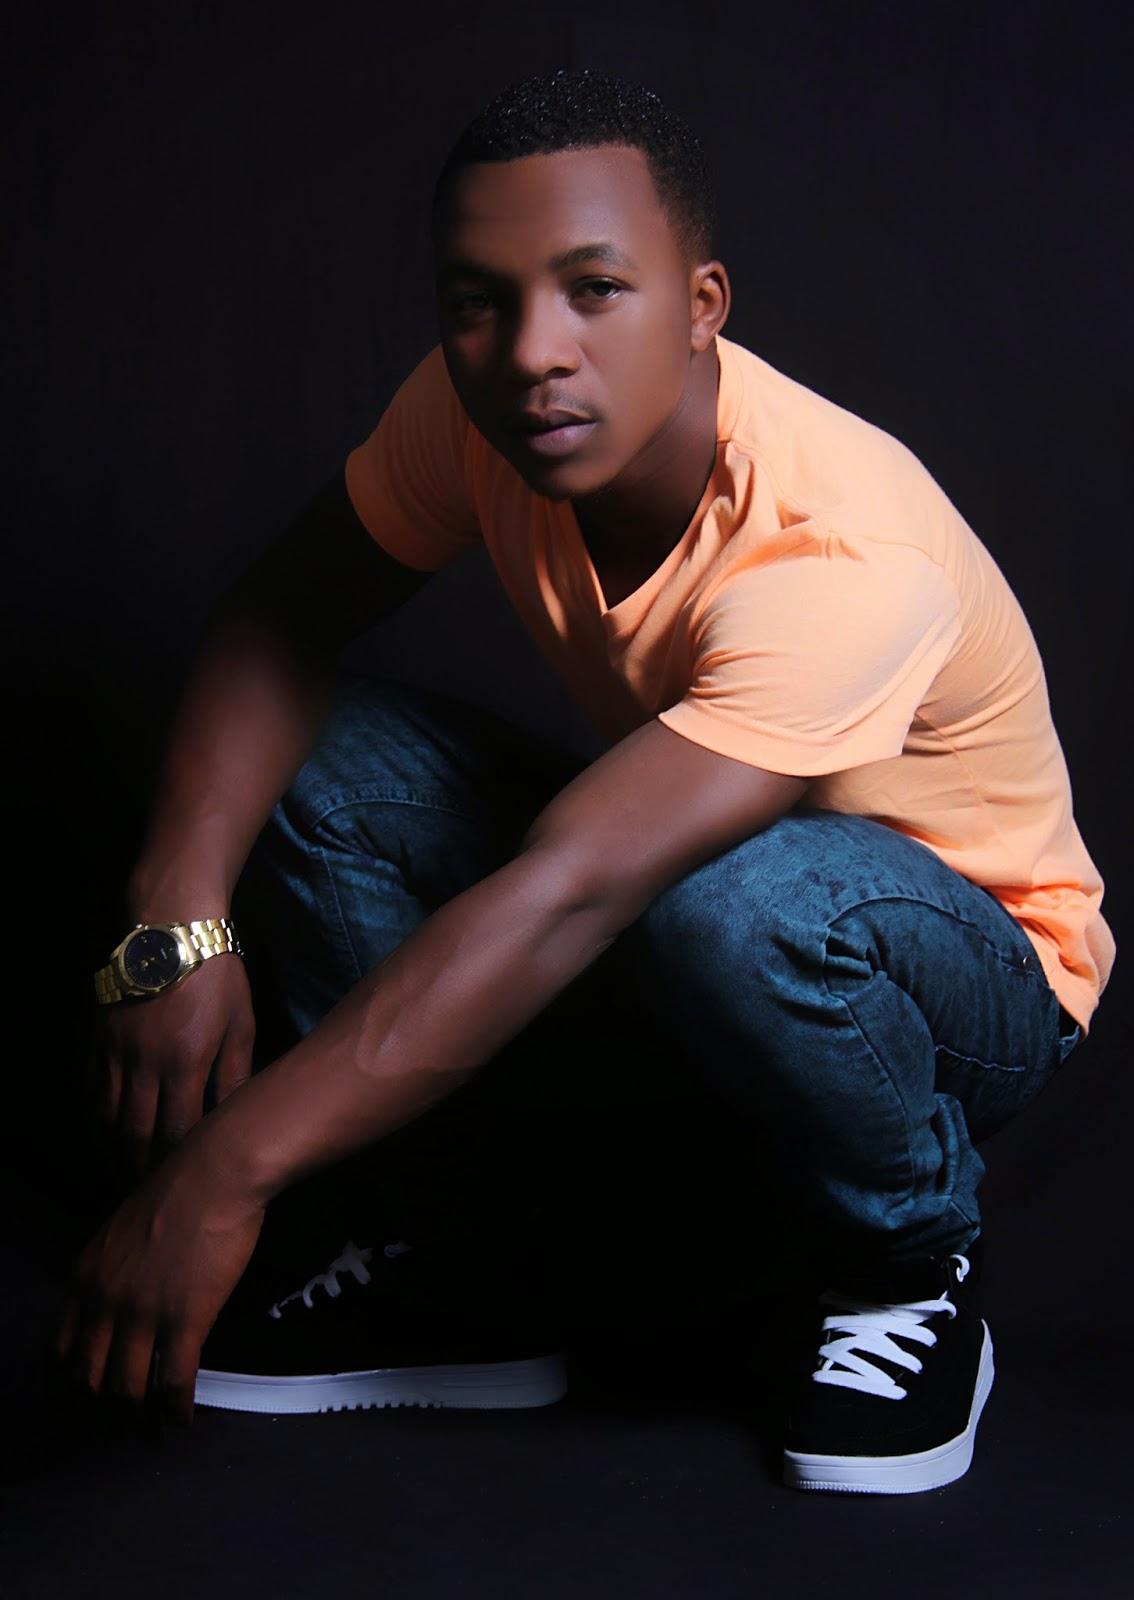 [Club Version] | Mo music - Basi Nenda | Download - DJ Mwanga